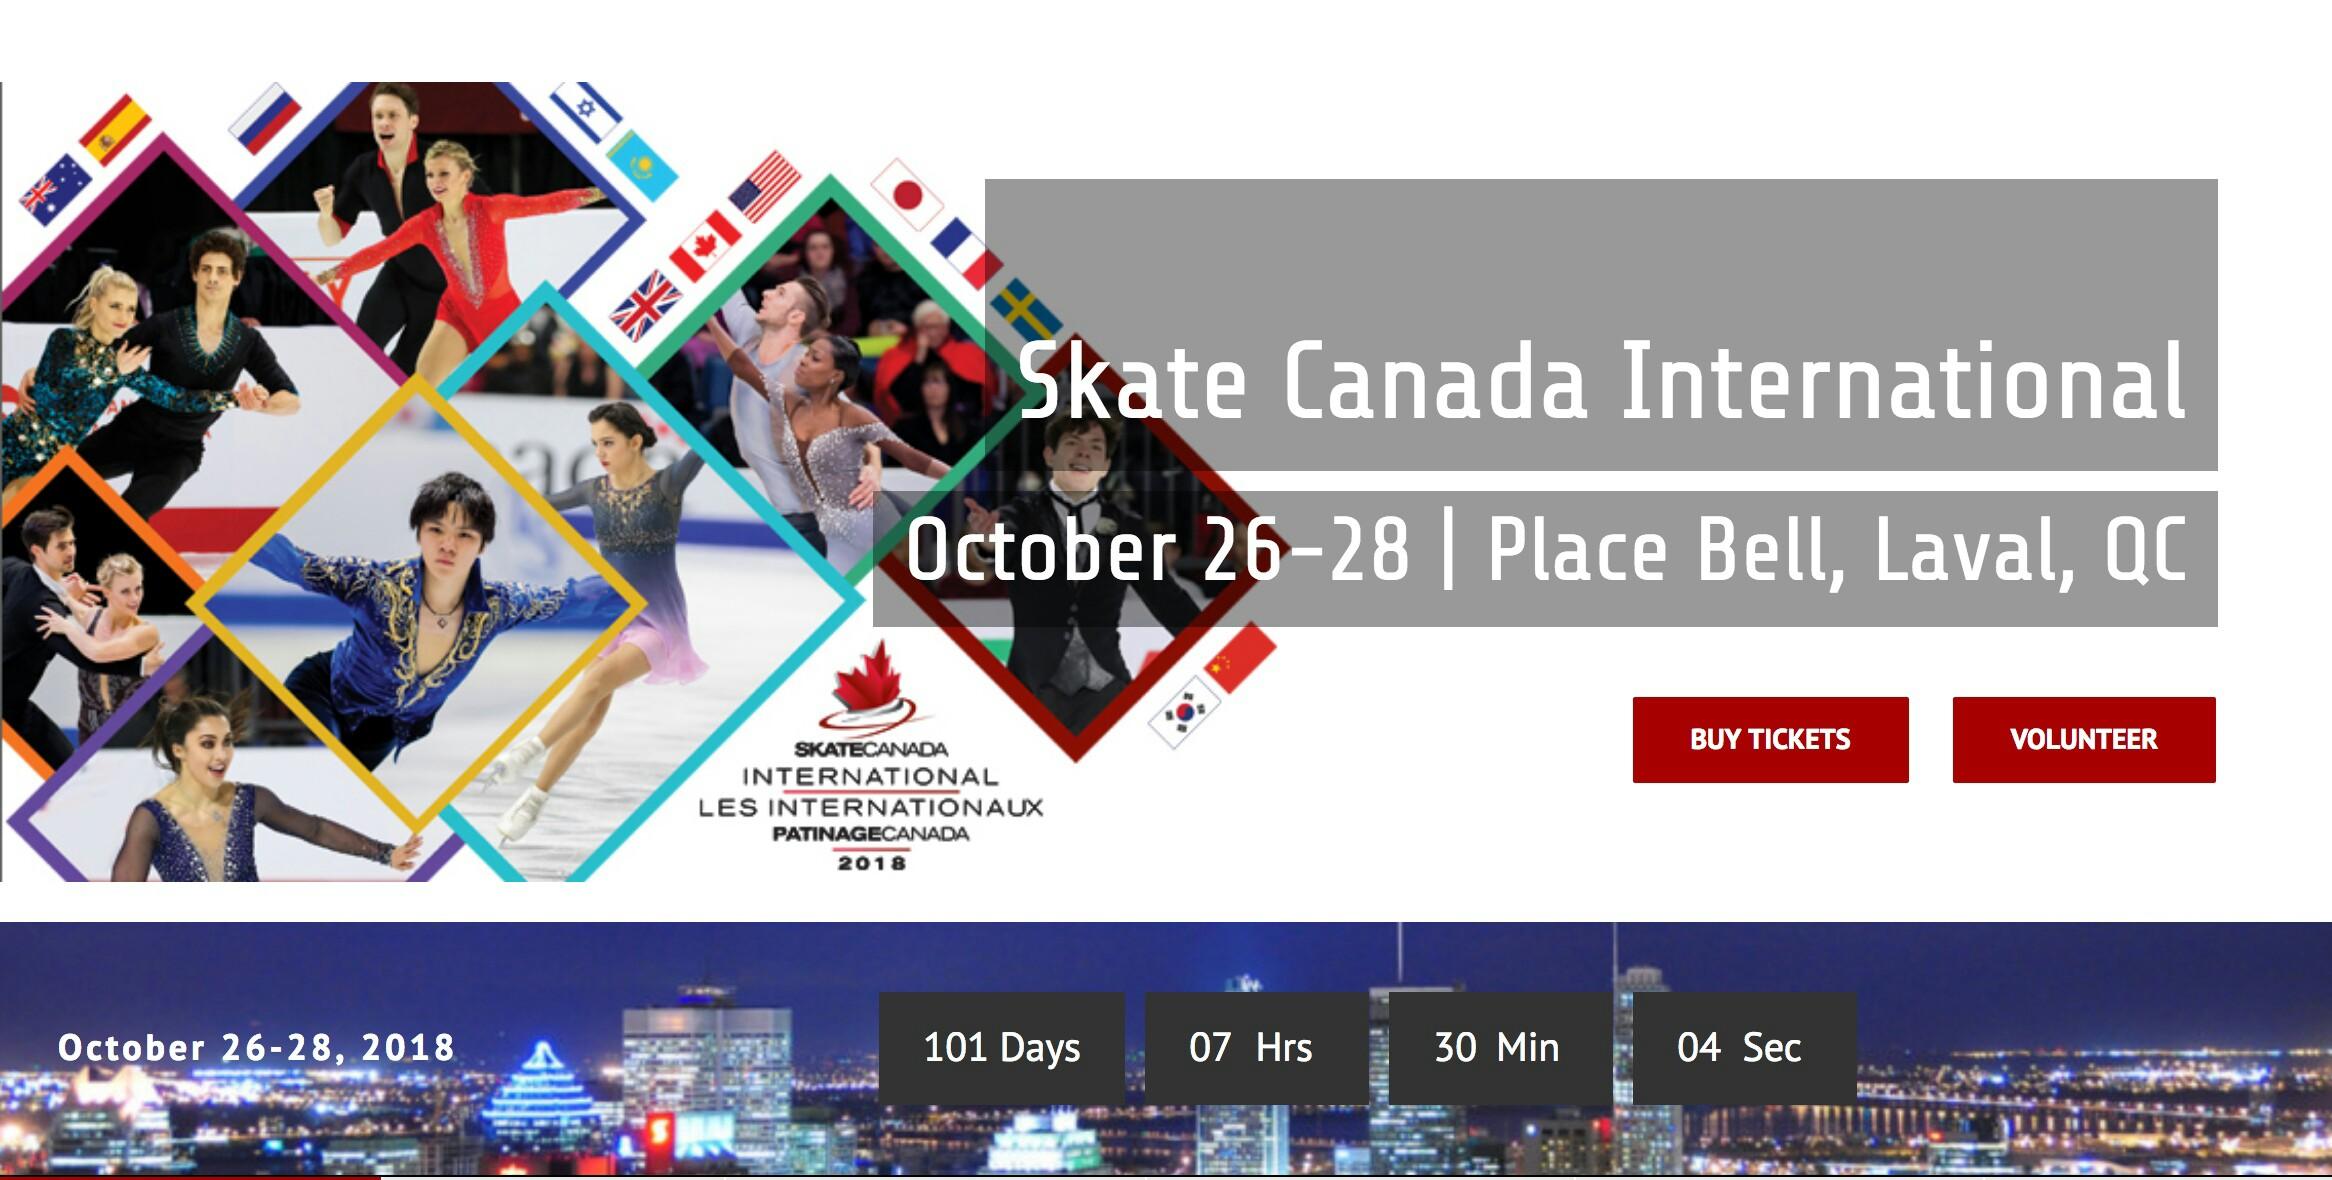 GP - 2 этап. Oct 26 - Oct 28 2018, Skate Canada, Laval, QC /CAN ATrl50JblRg